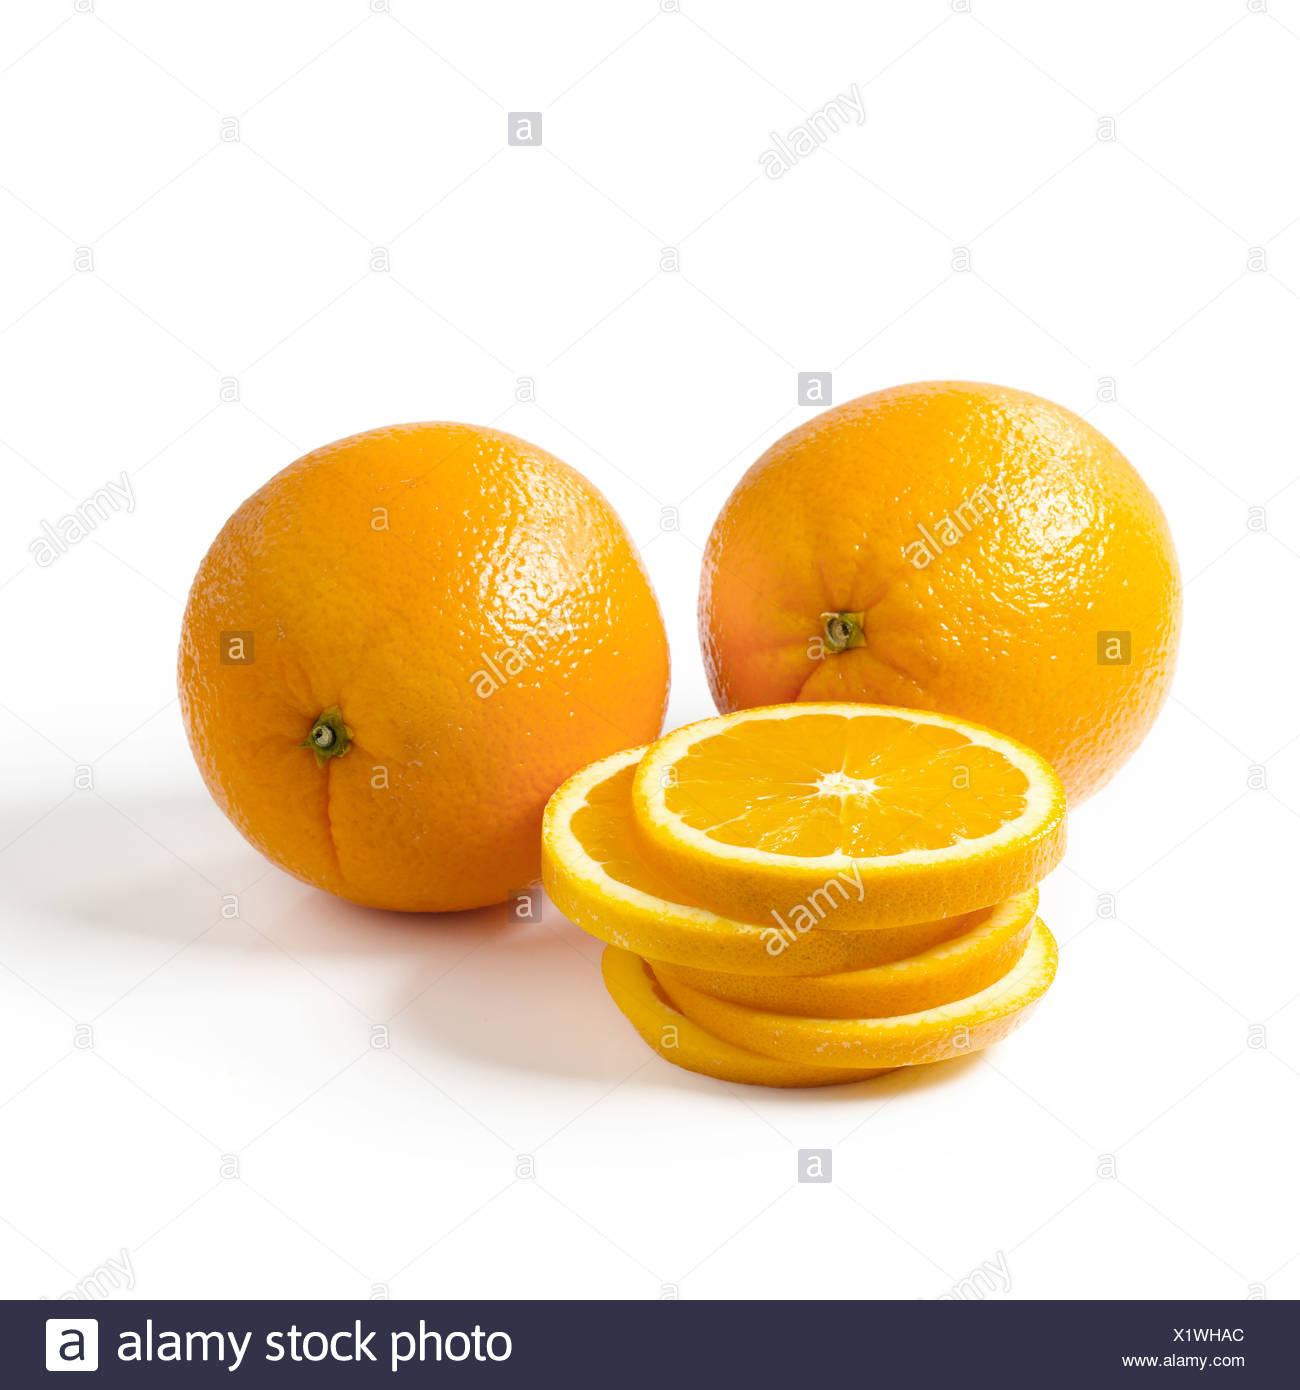 Oranges on a white background - Stock Image